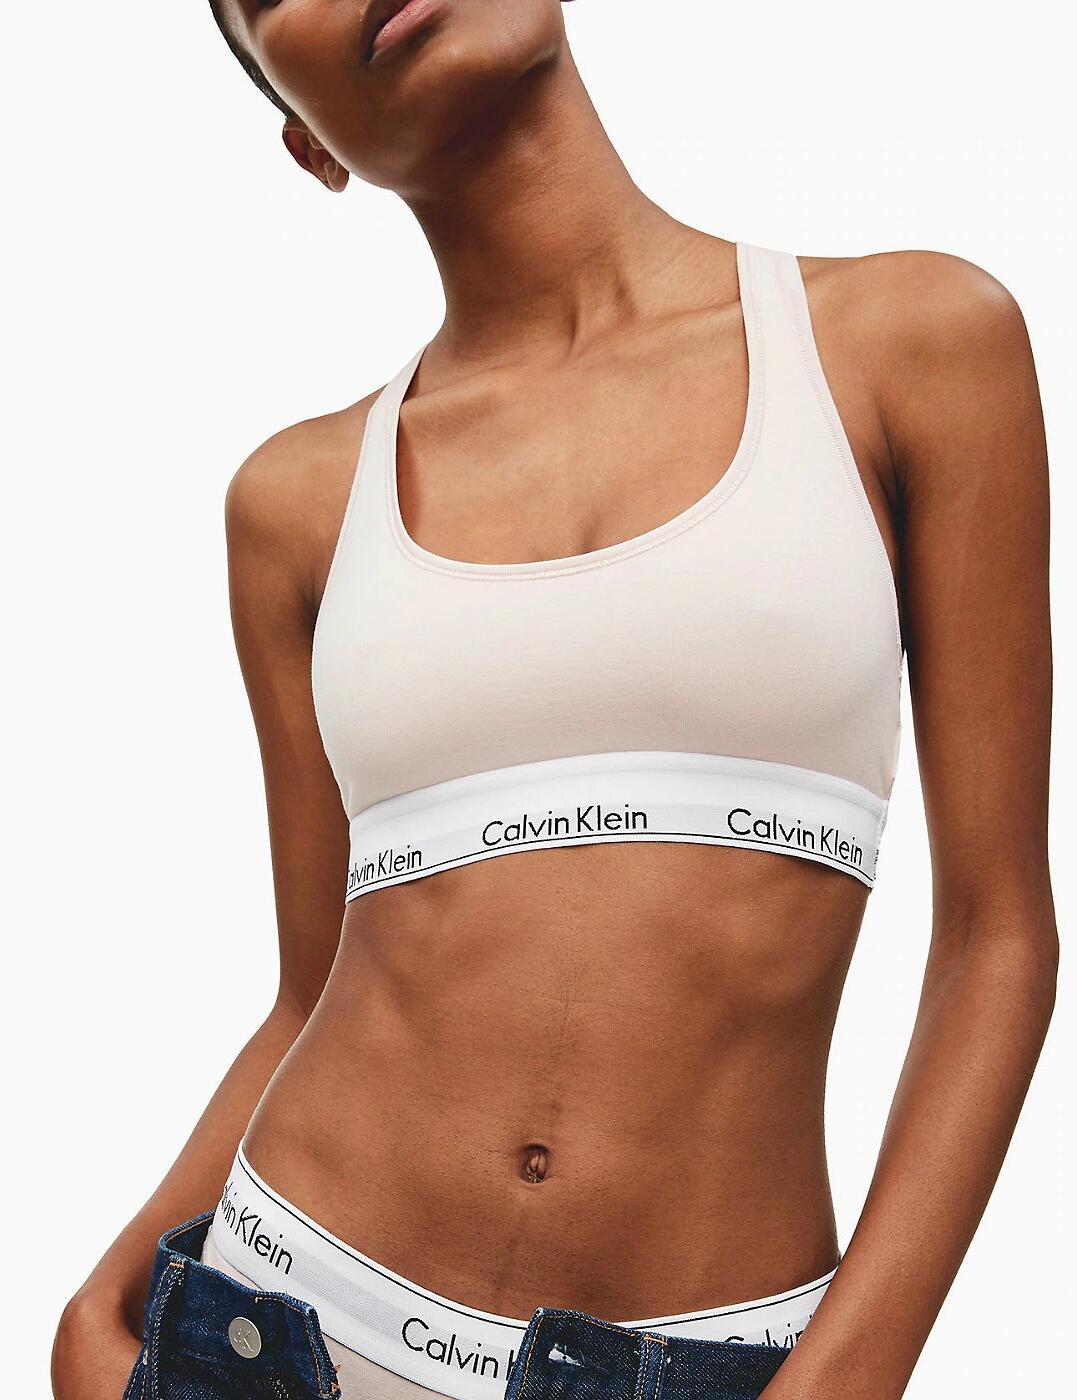 0000F3785E Calvin Klein Modern Cotton Bralette Bra Top - F3785E Nymphs Thigh